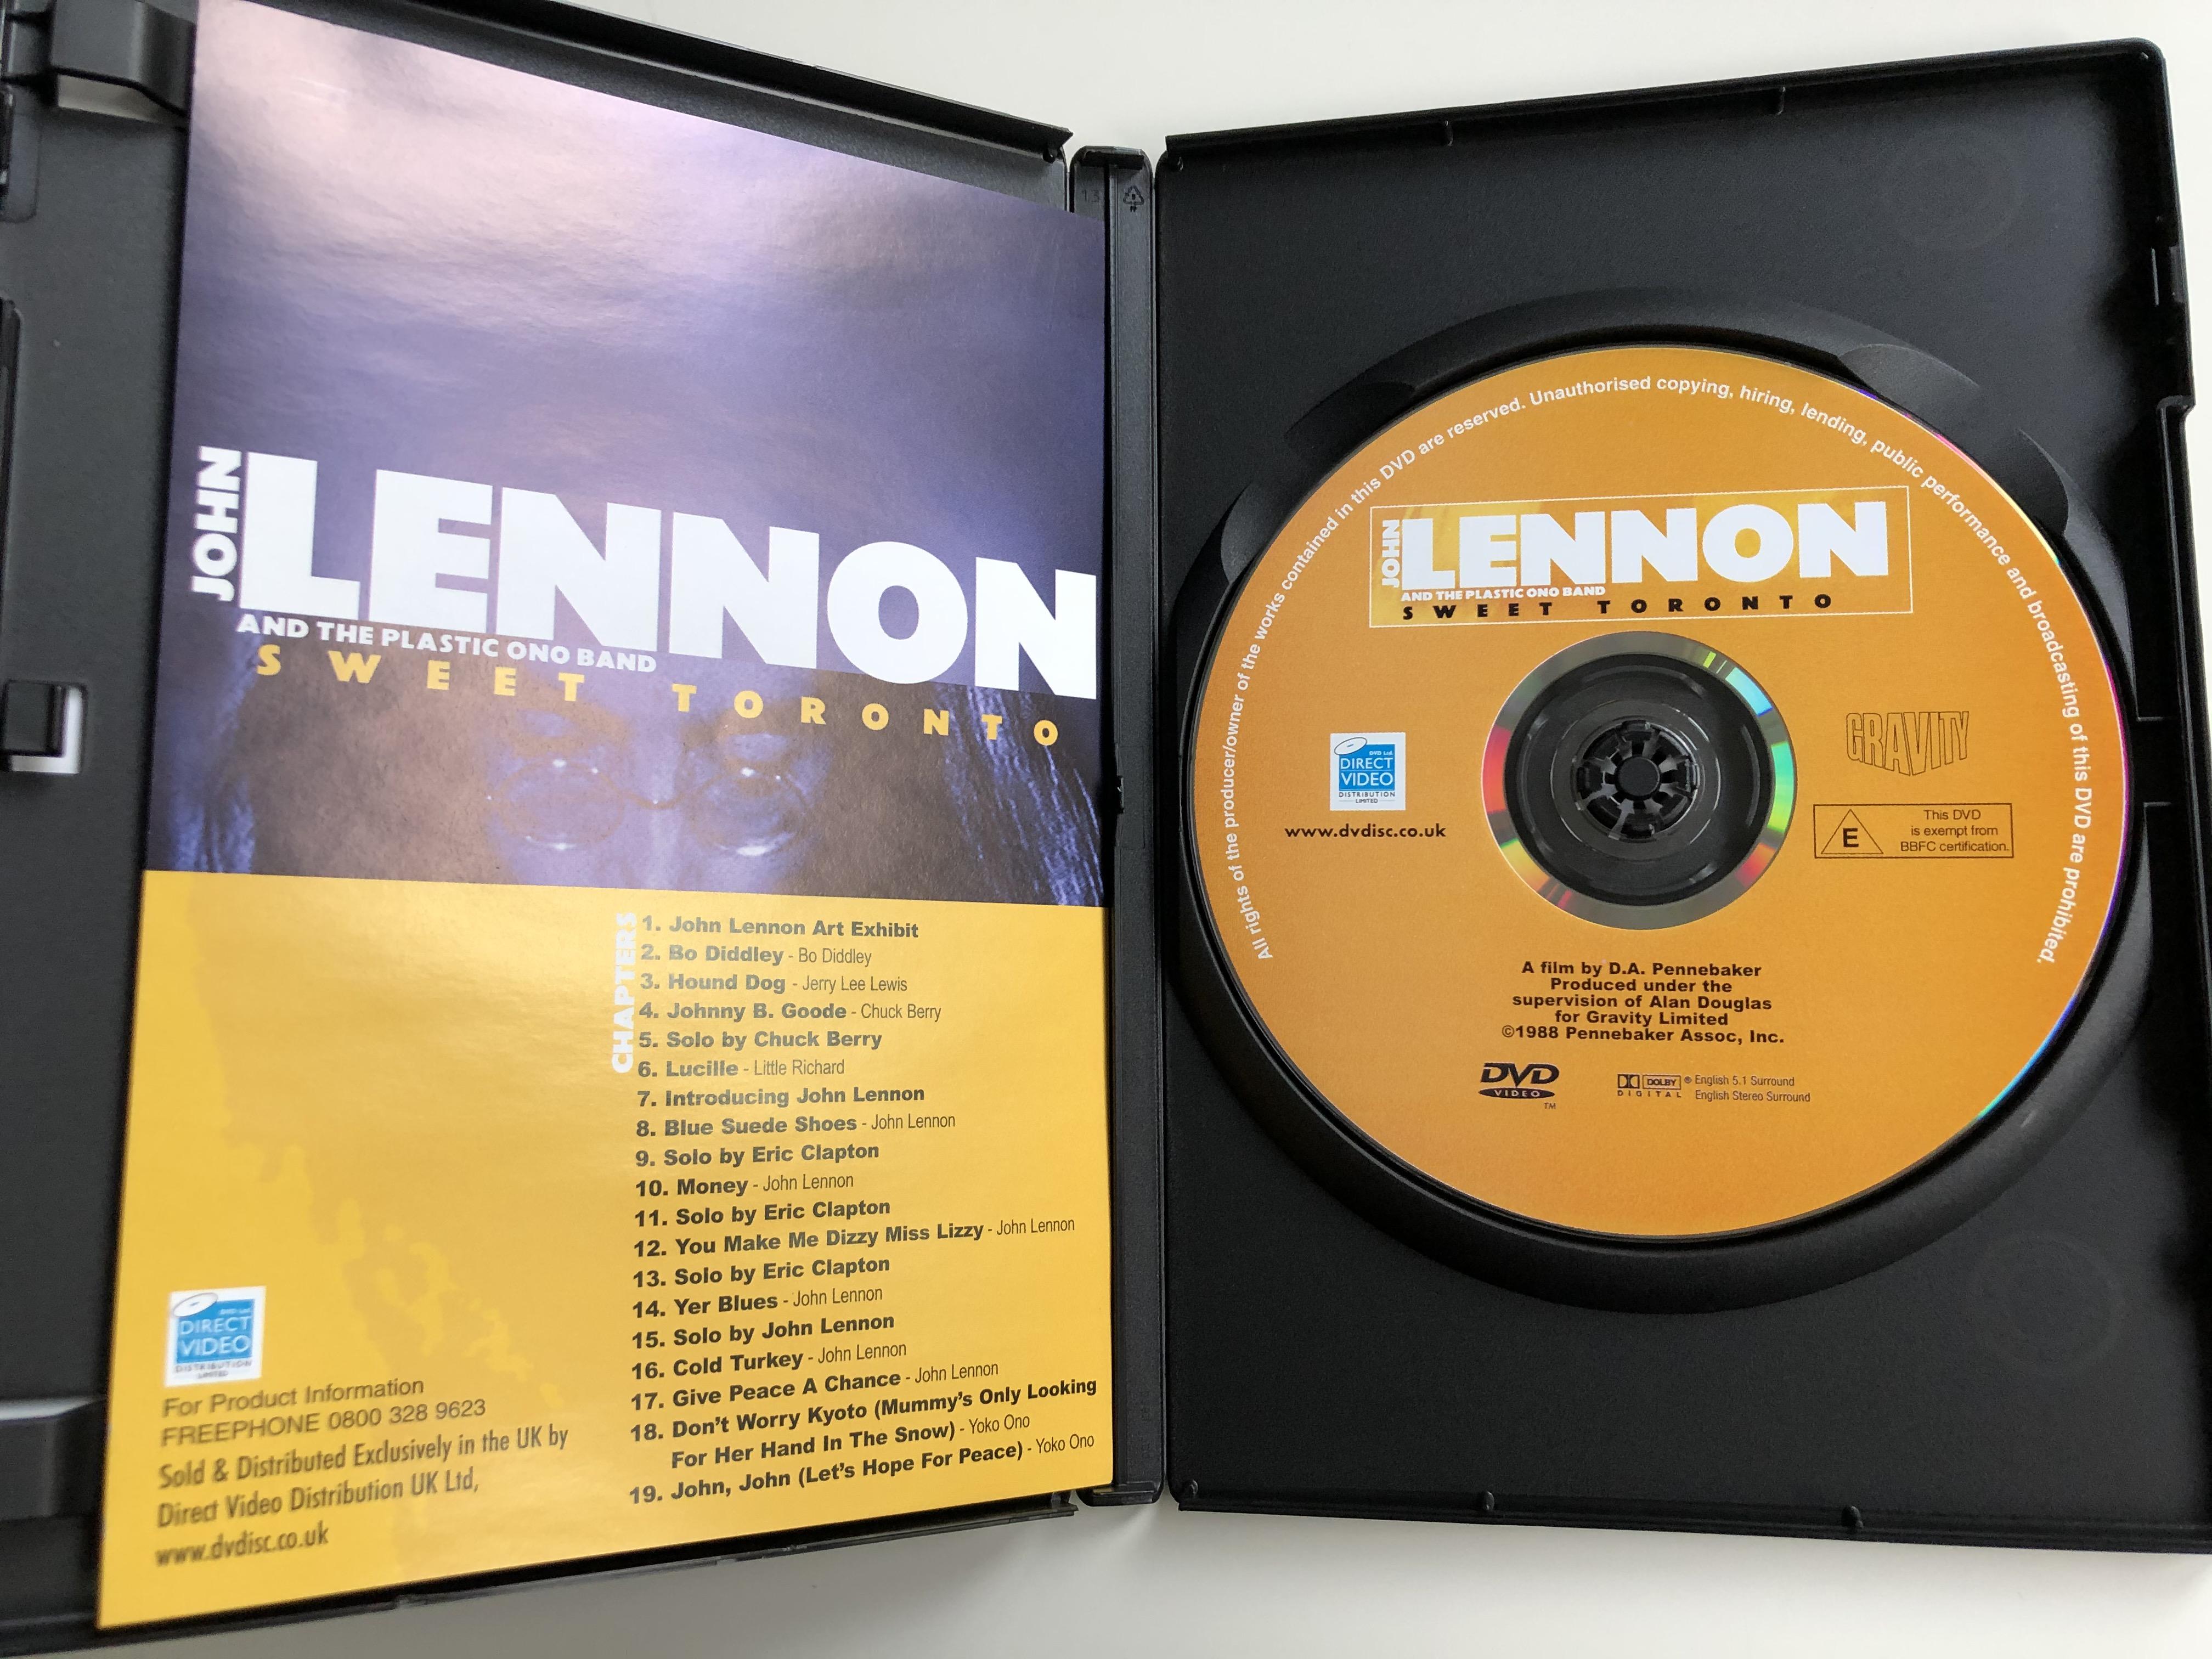 john-lennon-and-the-plastic-ono-band-sweet-toronto-dvd-1988-2.jpg